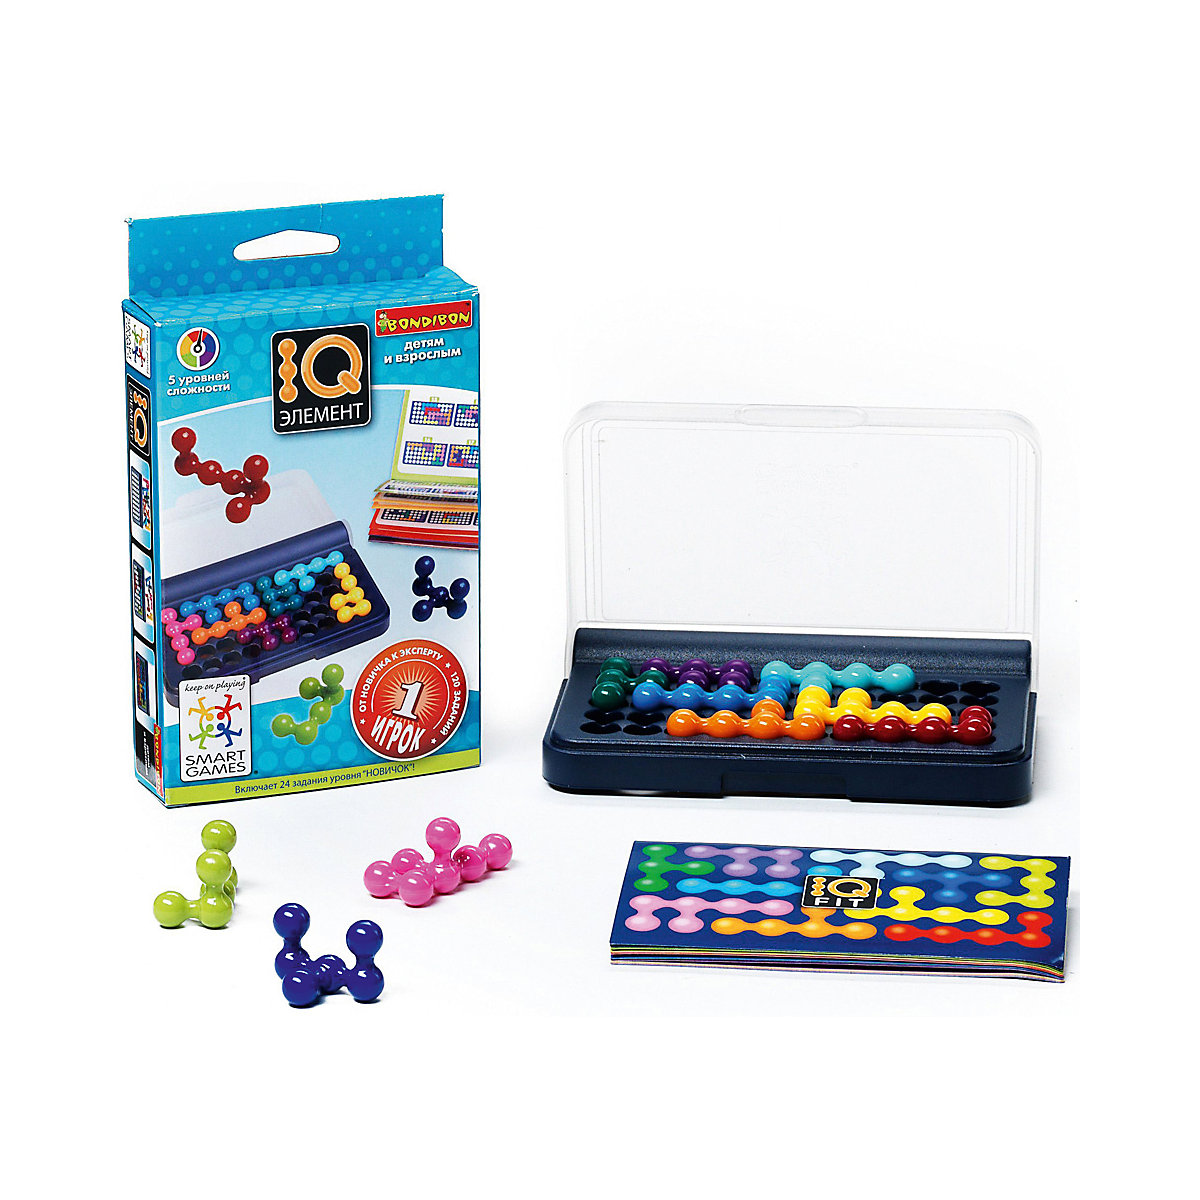 Фото - BONDIBON Party Games 4864505 education toys logic board game toy MTpromo for asus k43t k43ta k43tk x43t la 7551p laptop motherboard system board main board mainboard card logic board tested well